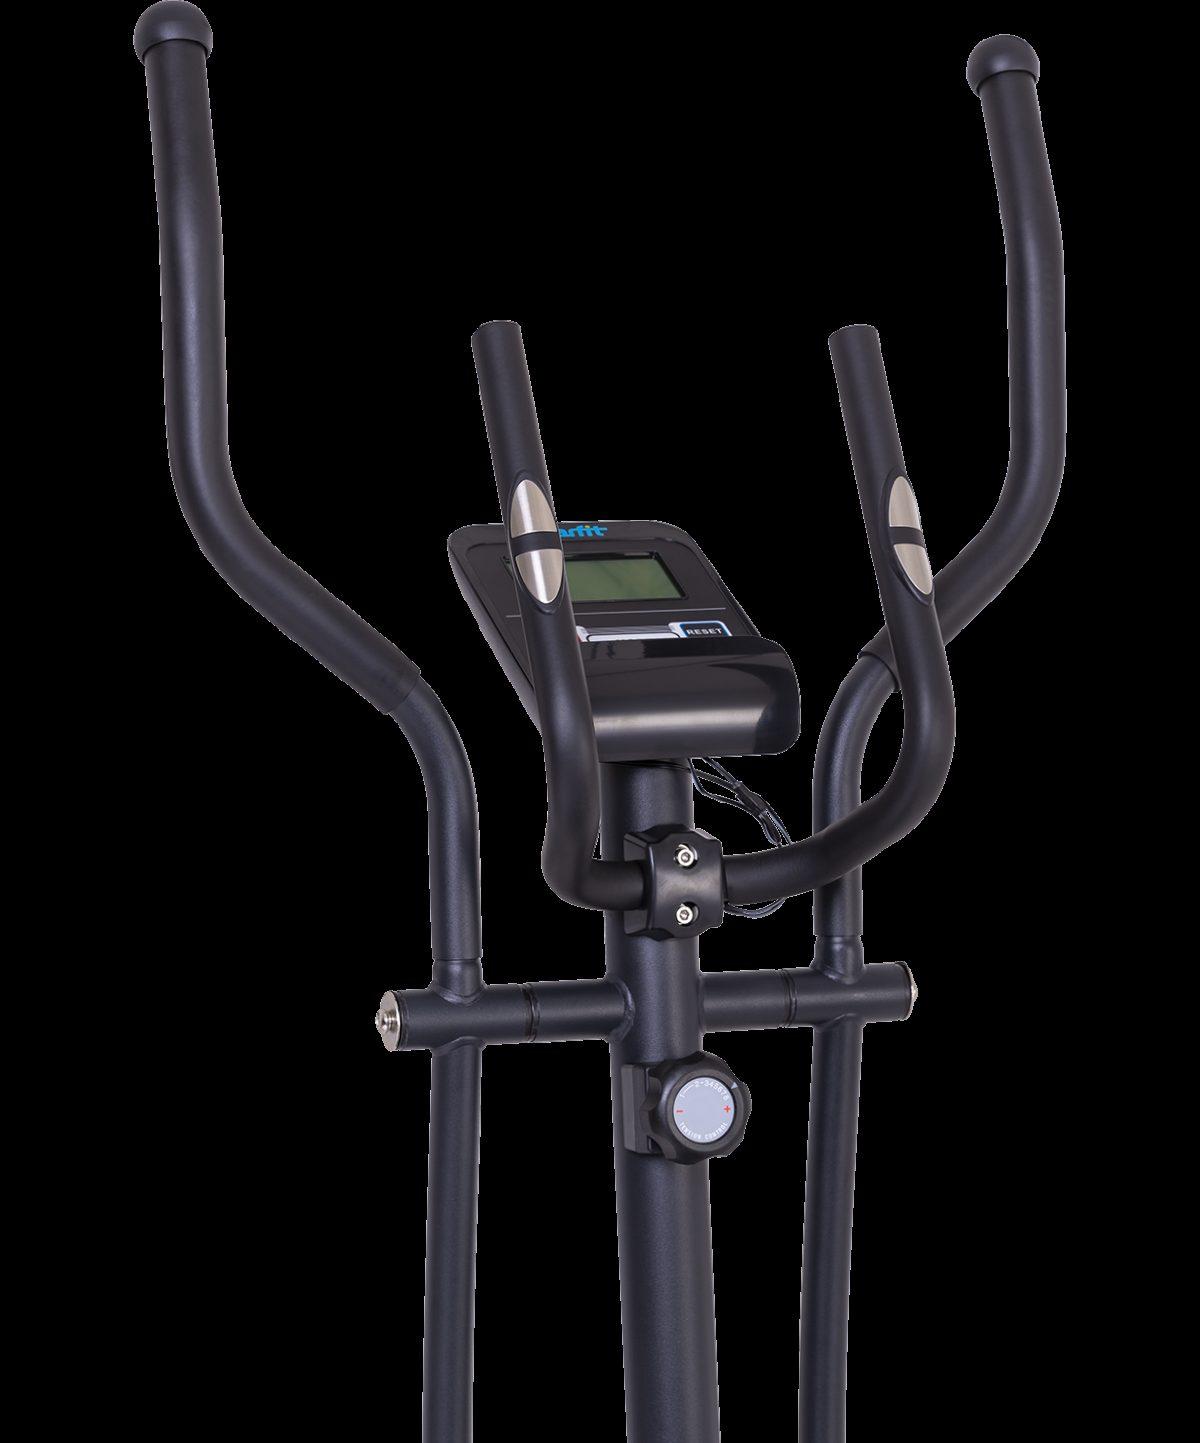 STARFIT Carrera New Эллиптический тренажер магнитный  VE-105 - 2